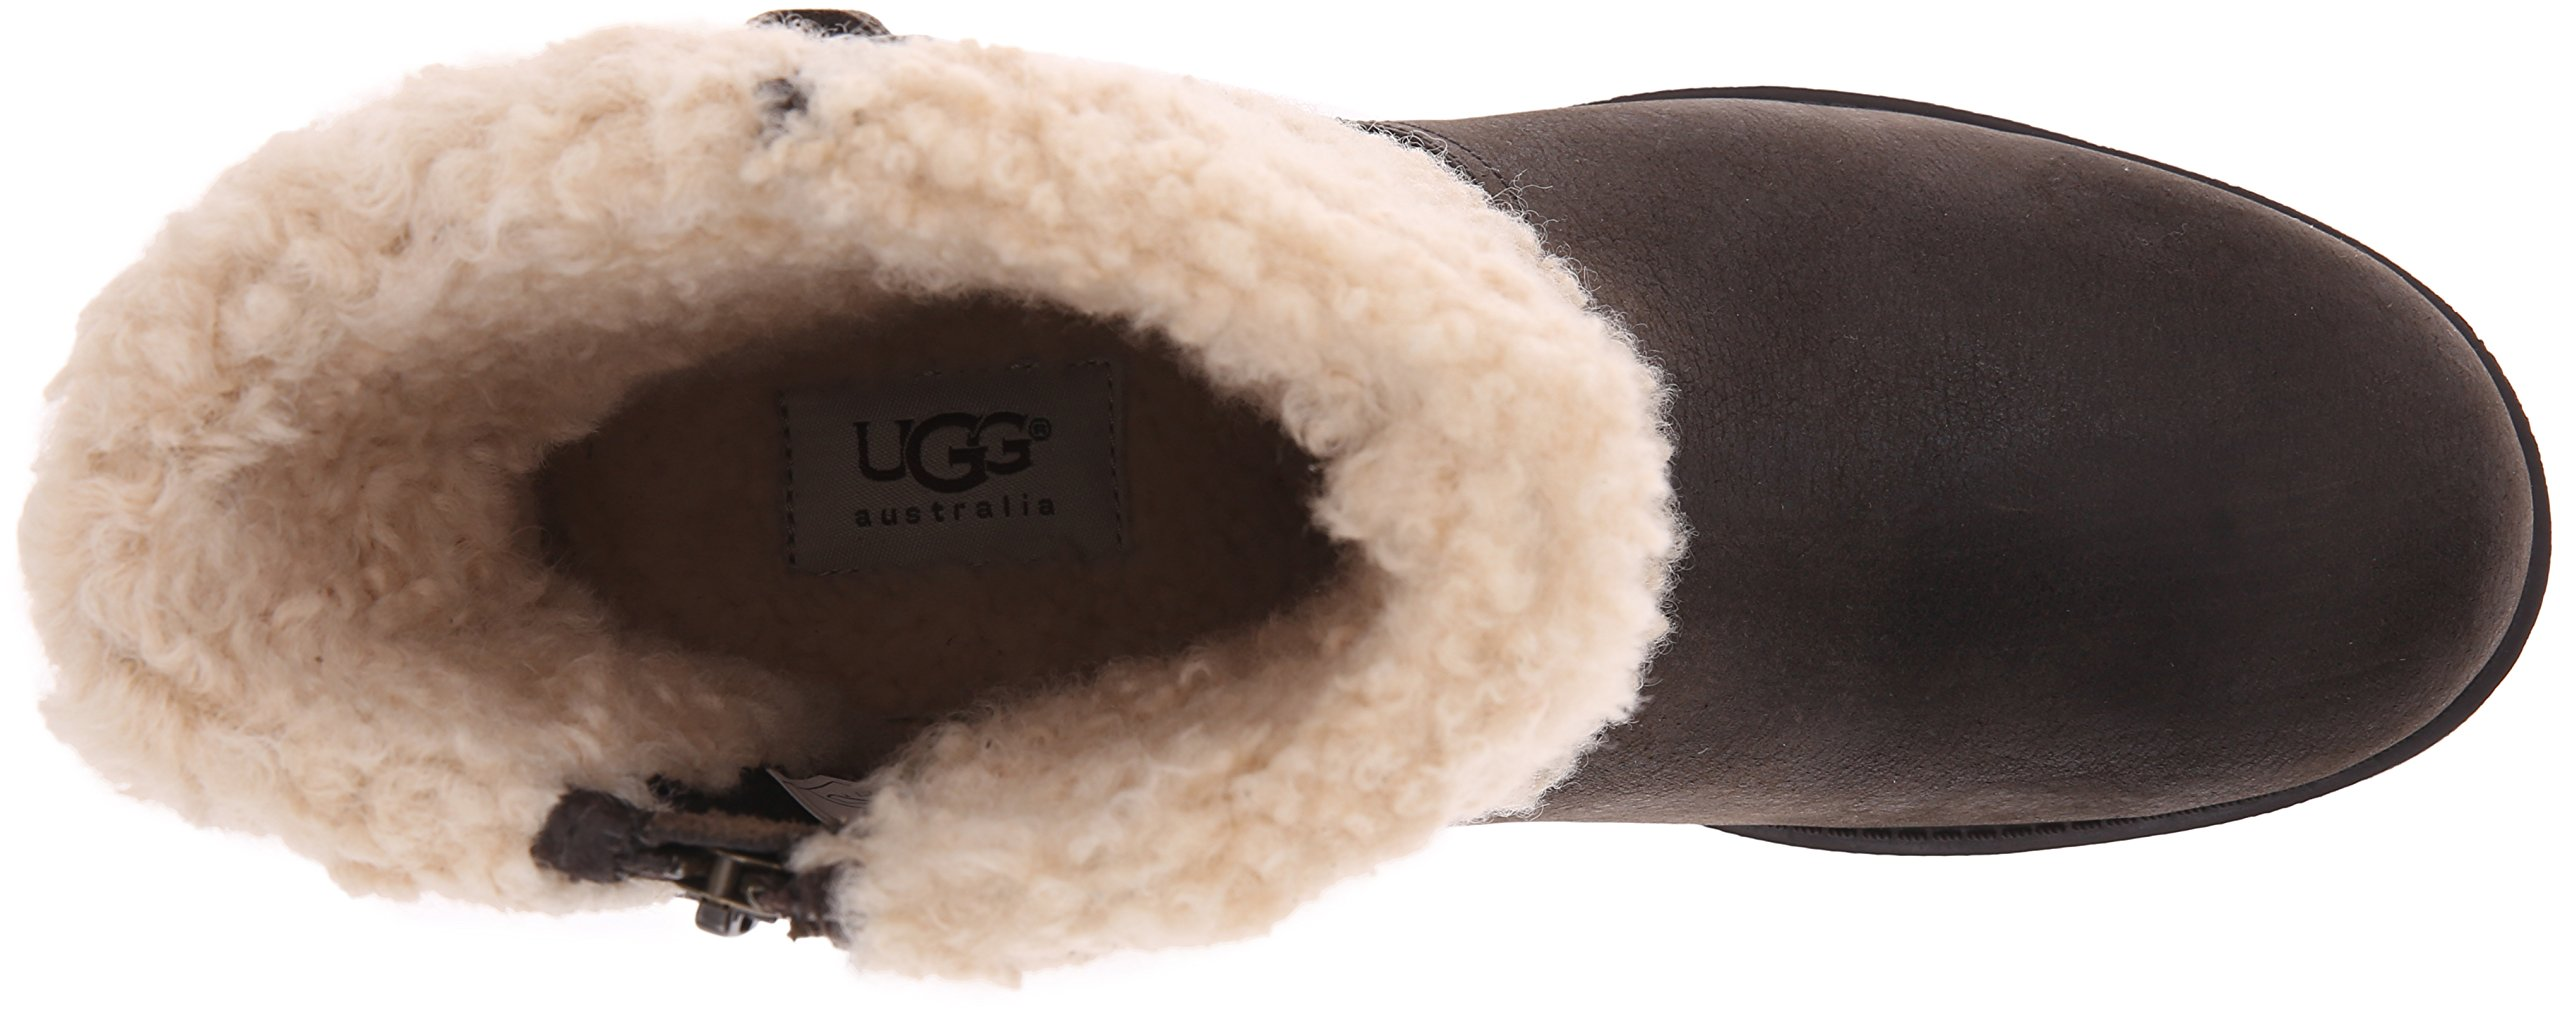 UGG Women's Blayre II Winter Boot, Lodge, 6 M US by UGG (Image #8)